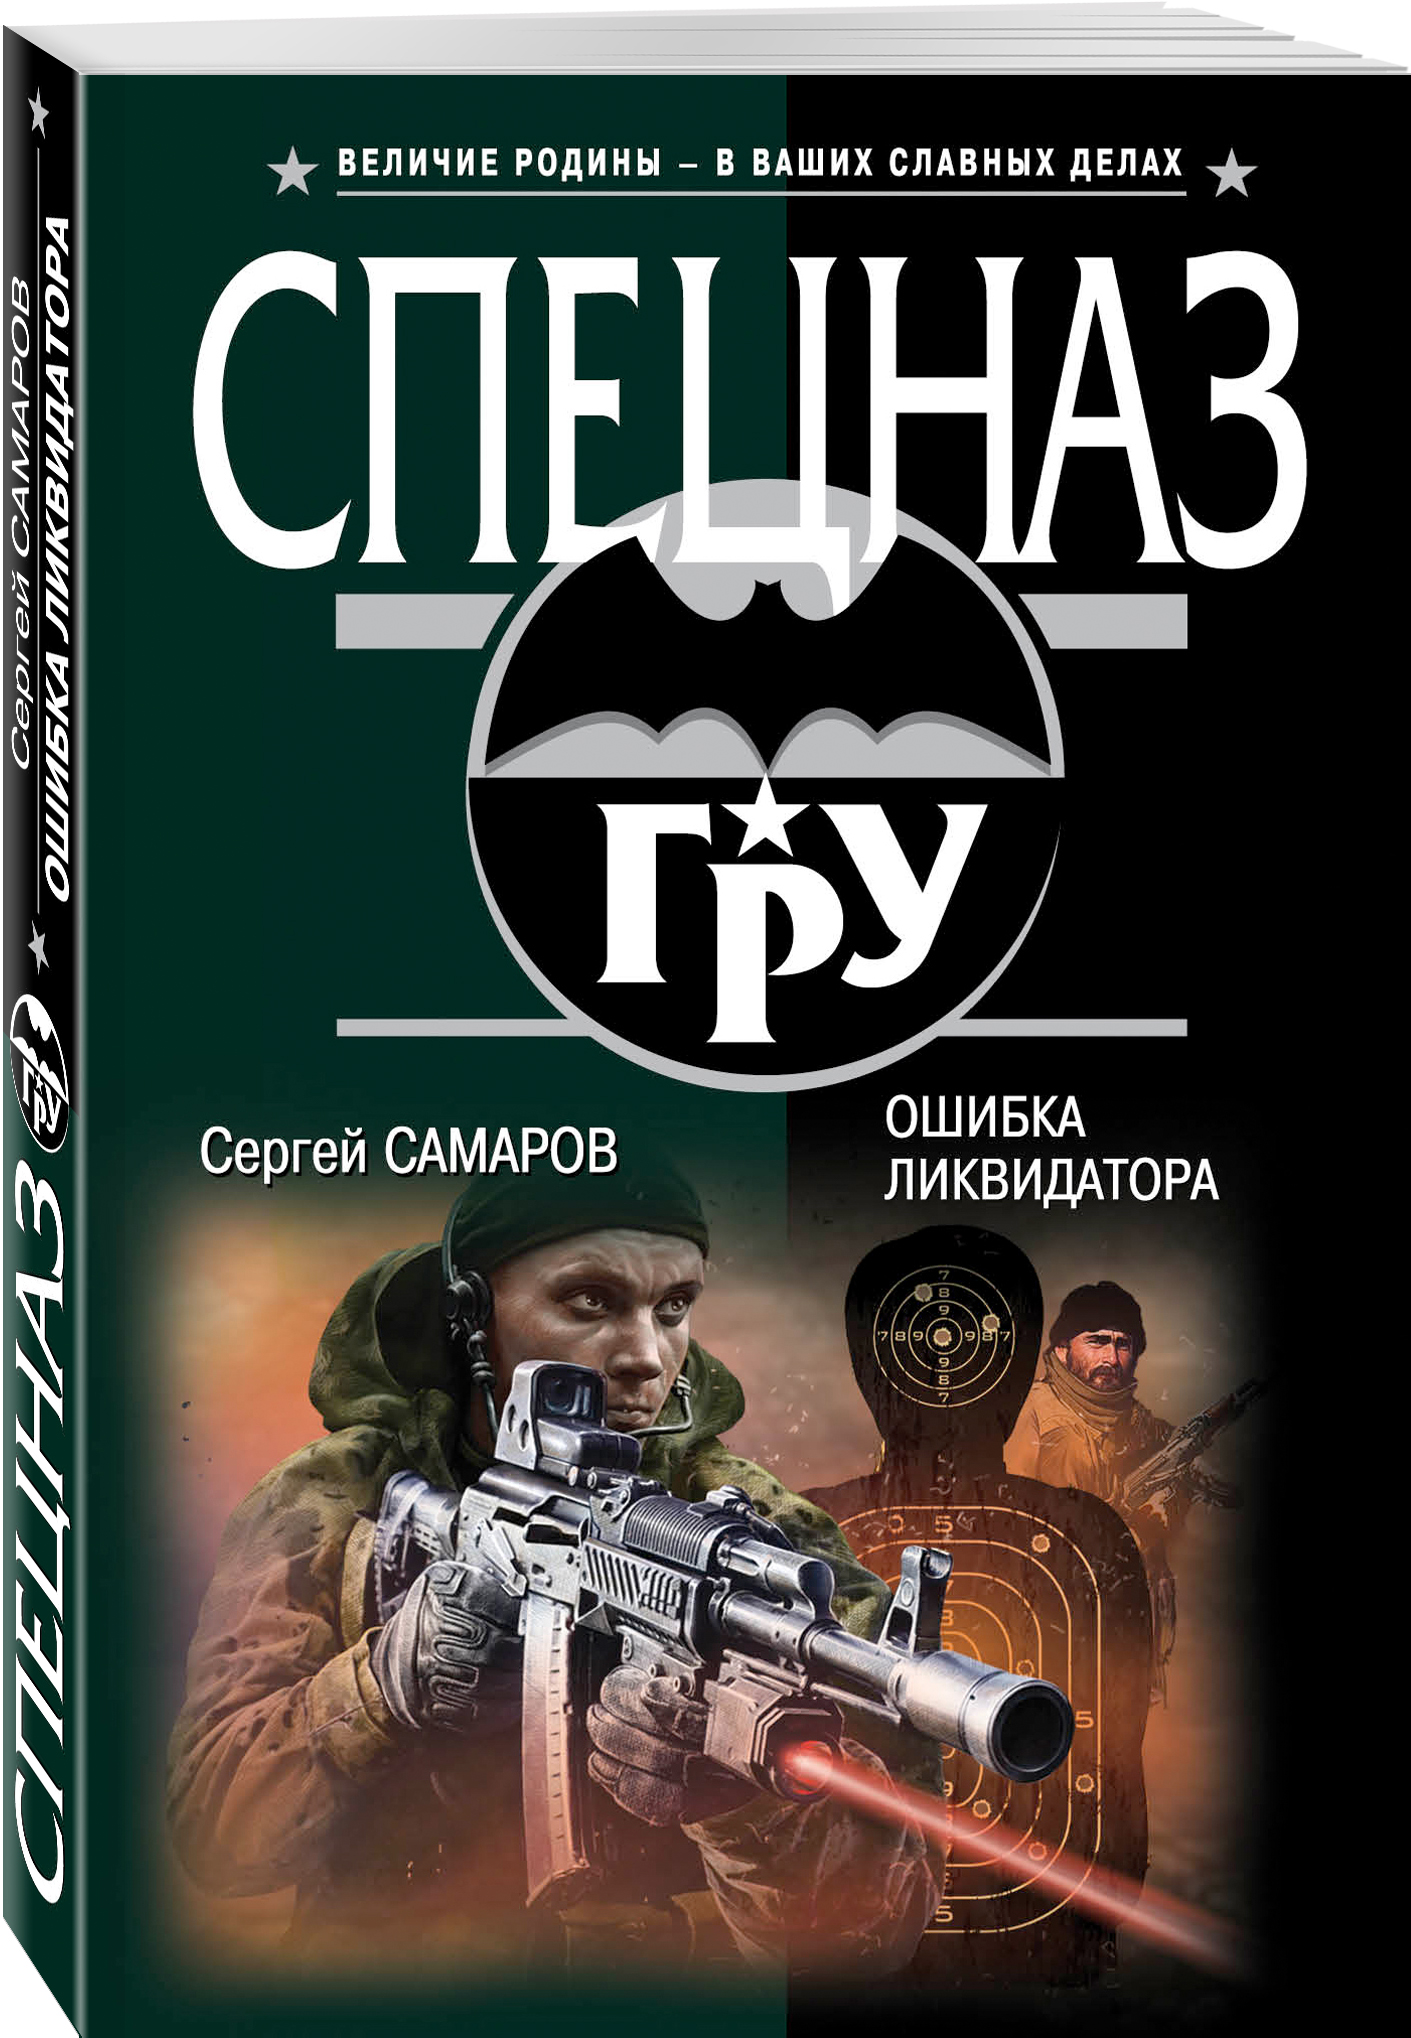 Самаров С.В. Ошибка ликвидатора